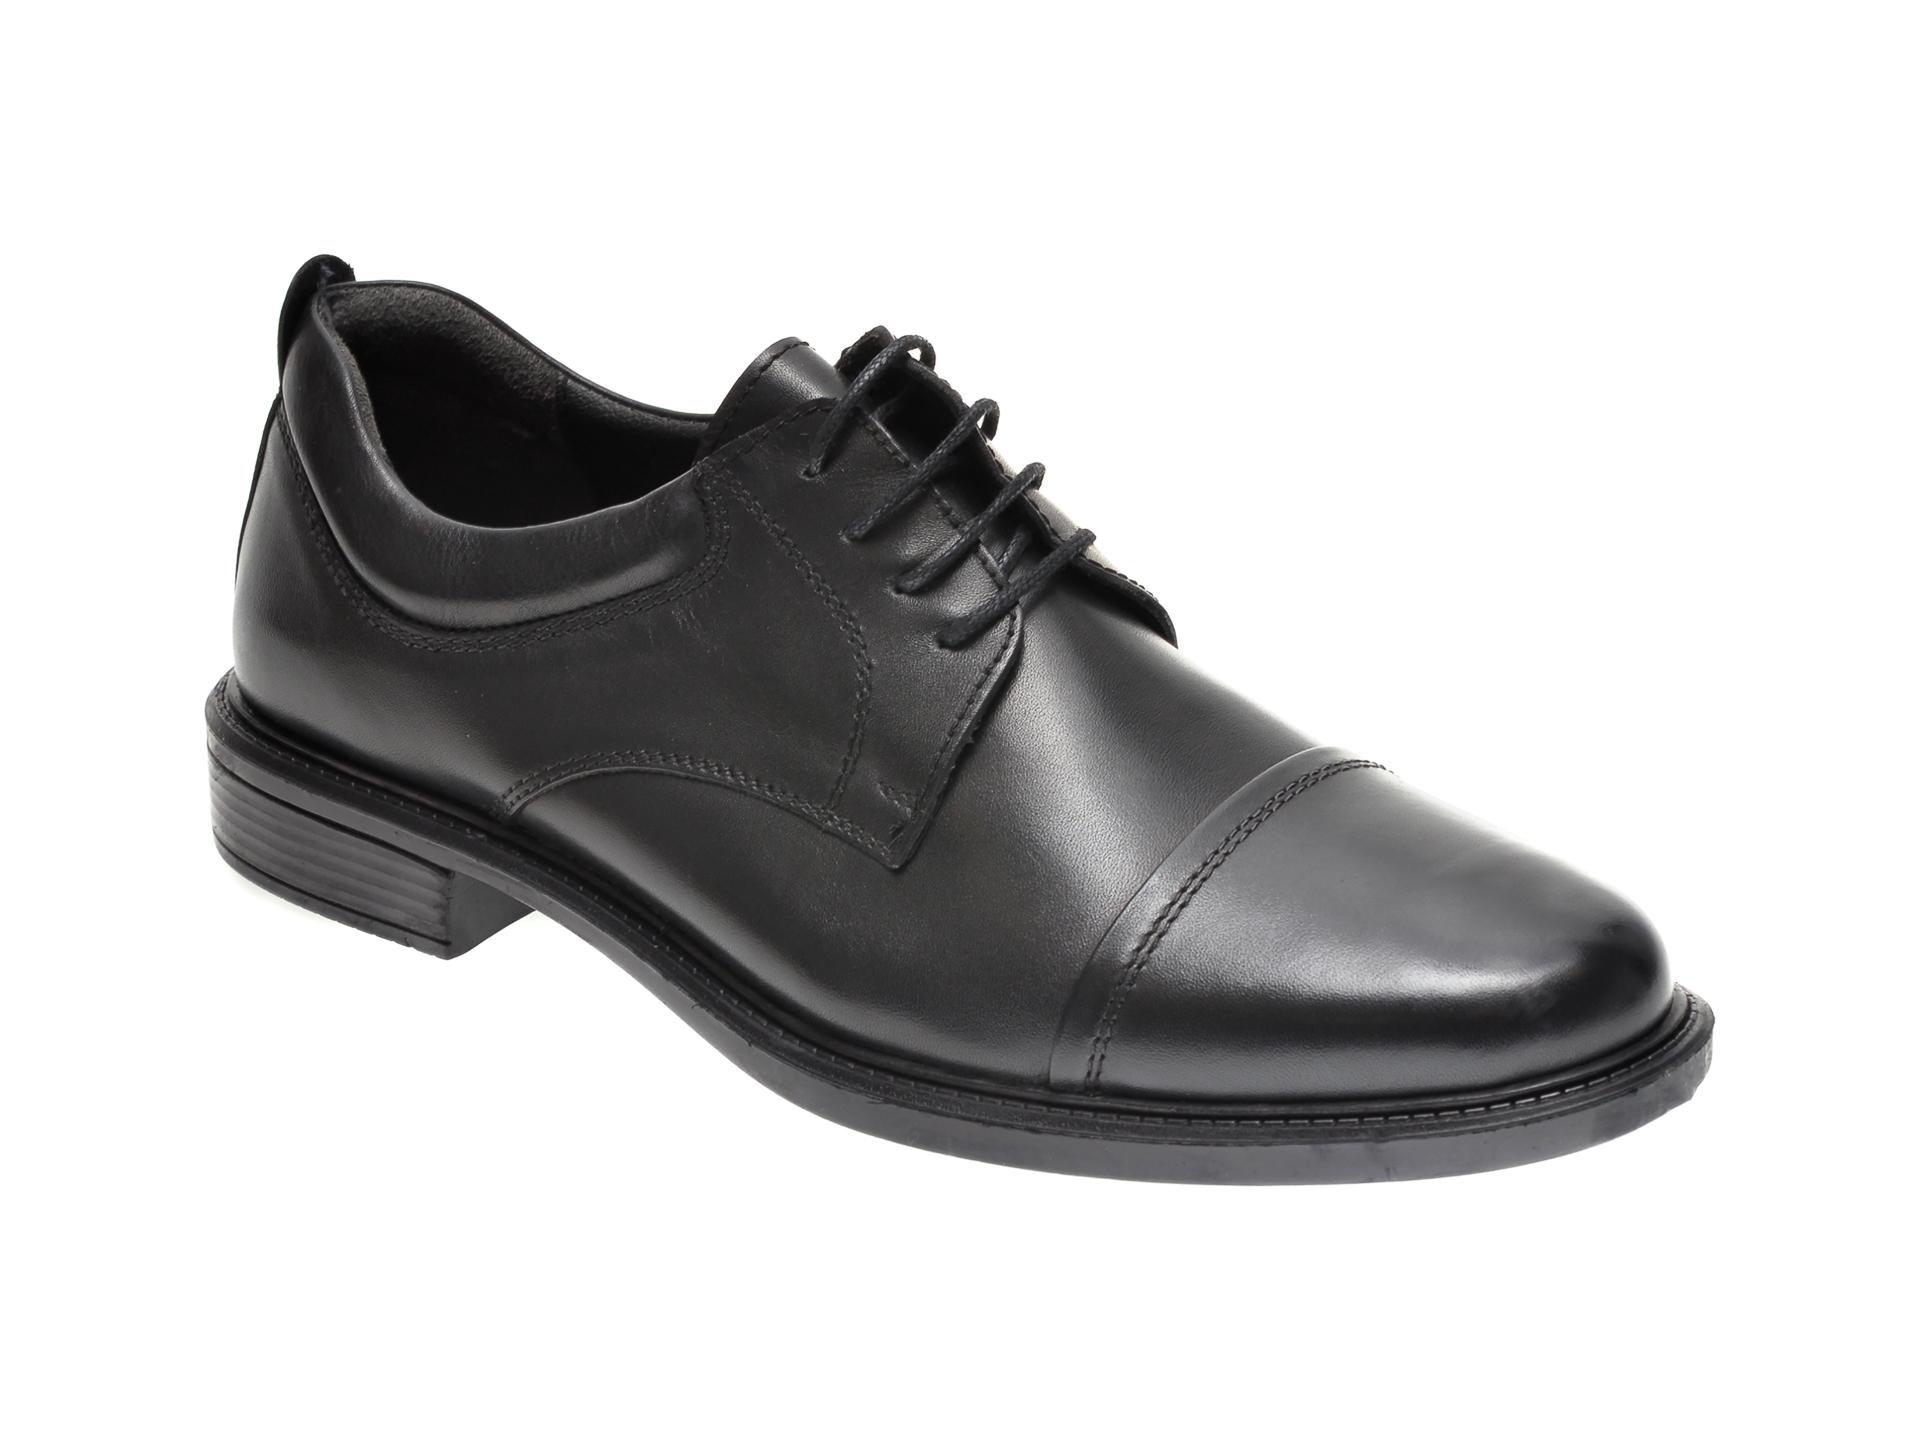 Pantofi OTTER negri, C019, din piele naturala imagine